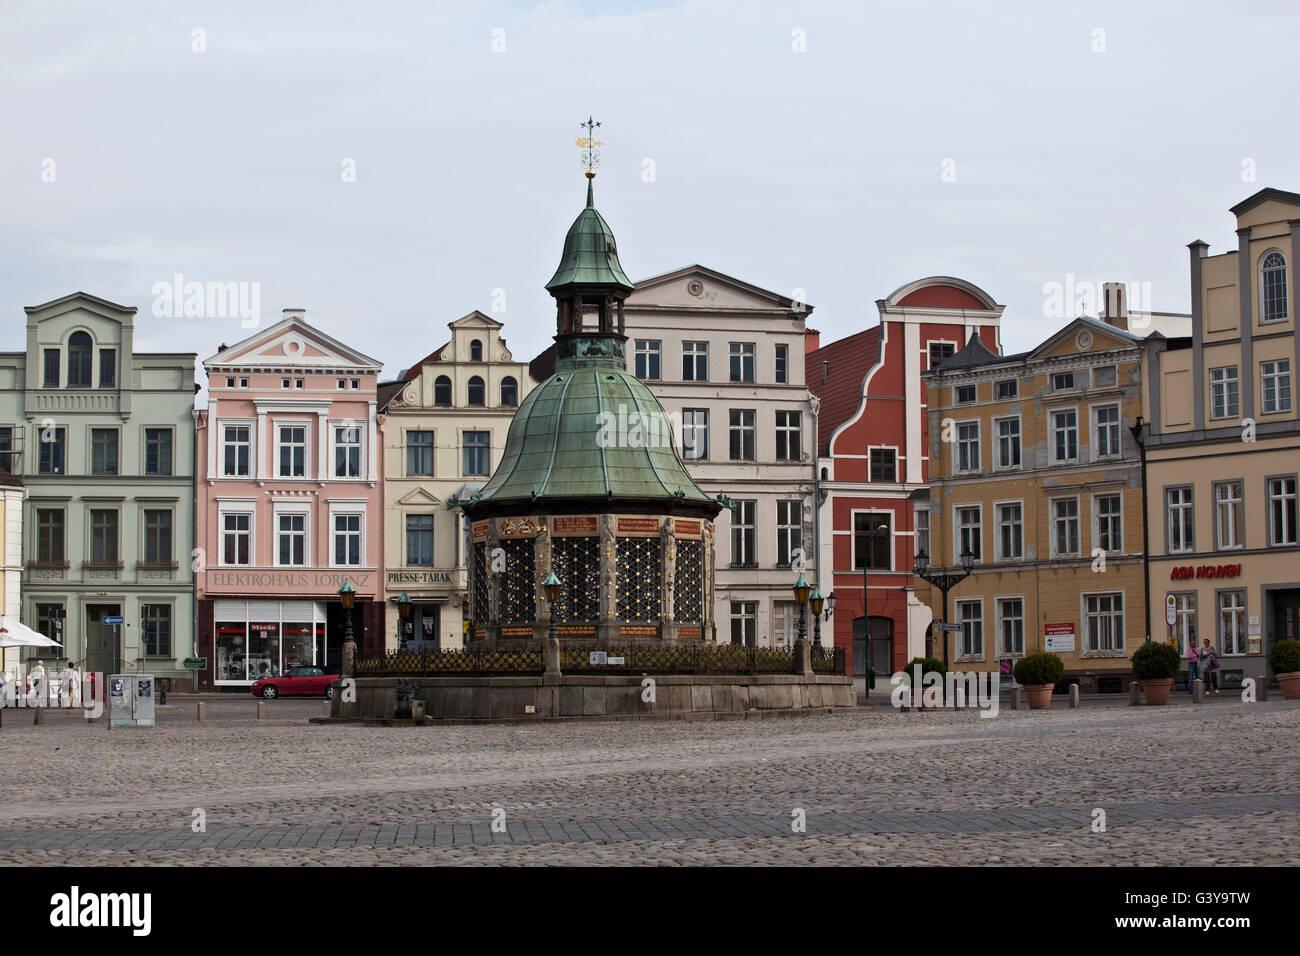 Water art in the market square, Wismar, Mecklenburg-Western Pomerania - Stock Image